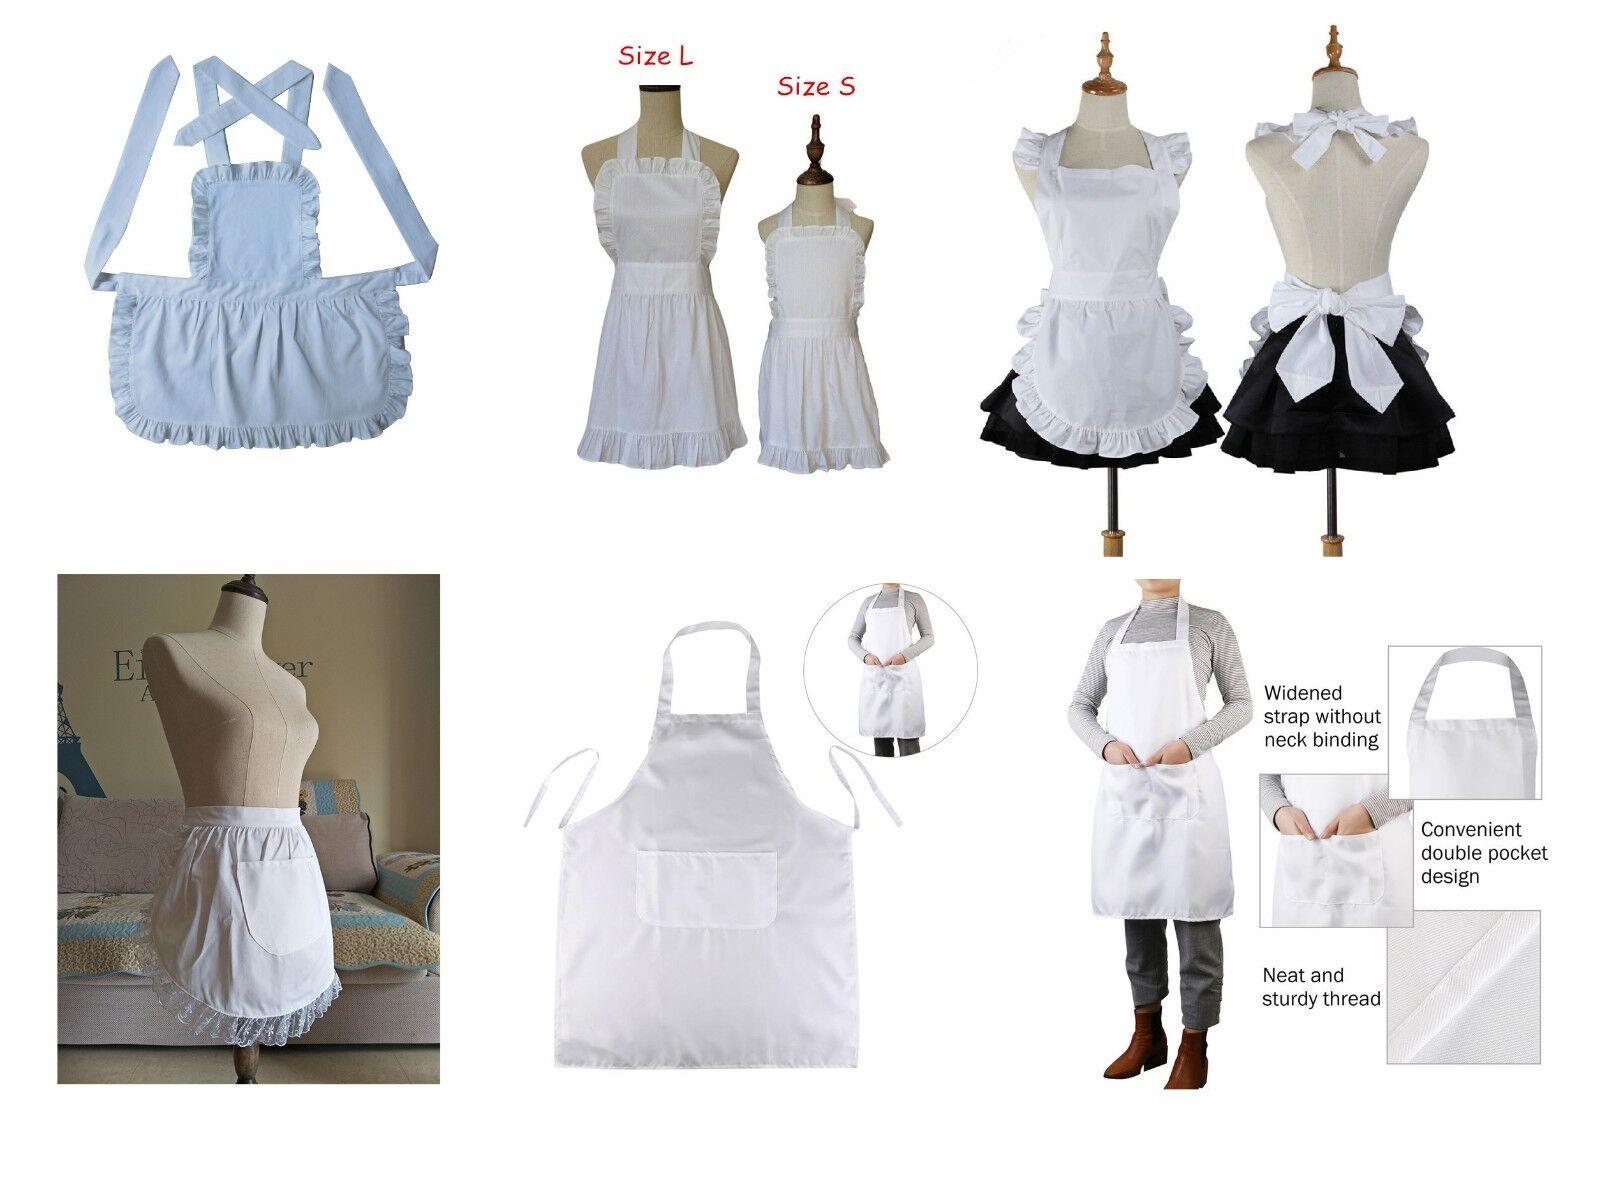 White Vintage Retro With Pocket Pockets Victorian Dress Half Apron Pinny Girls